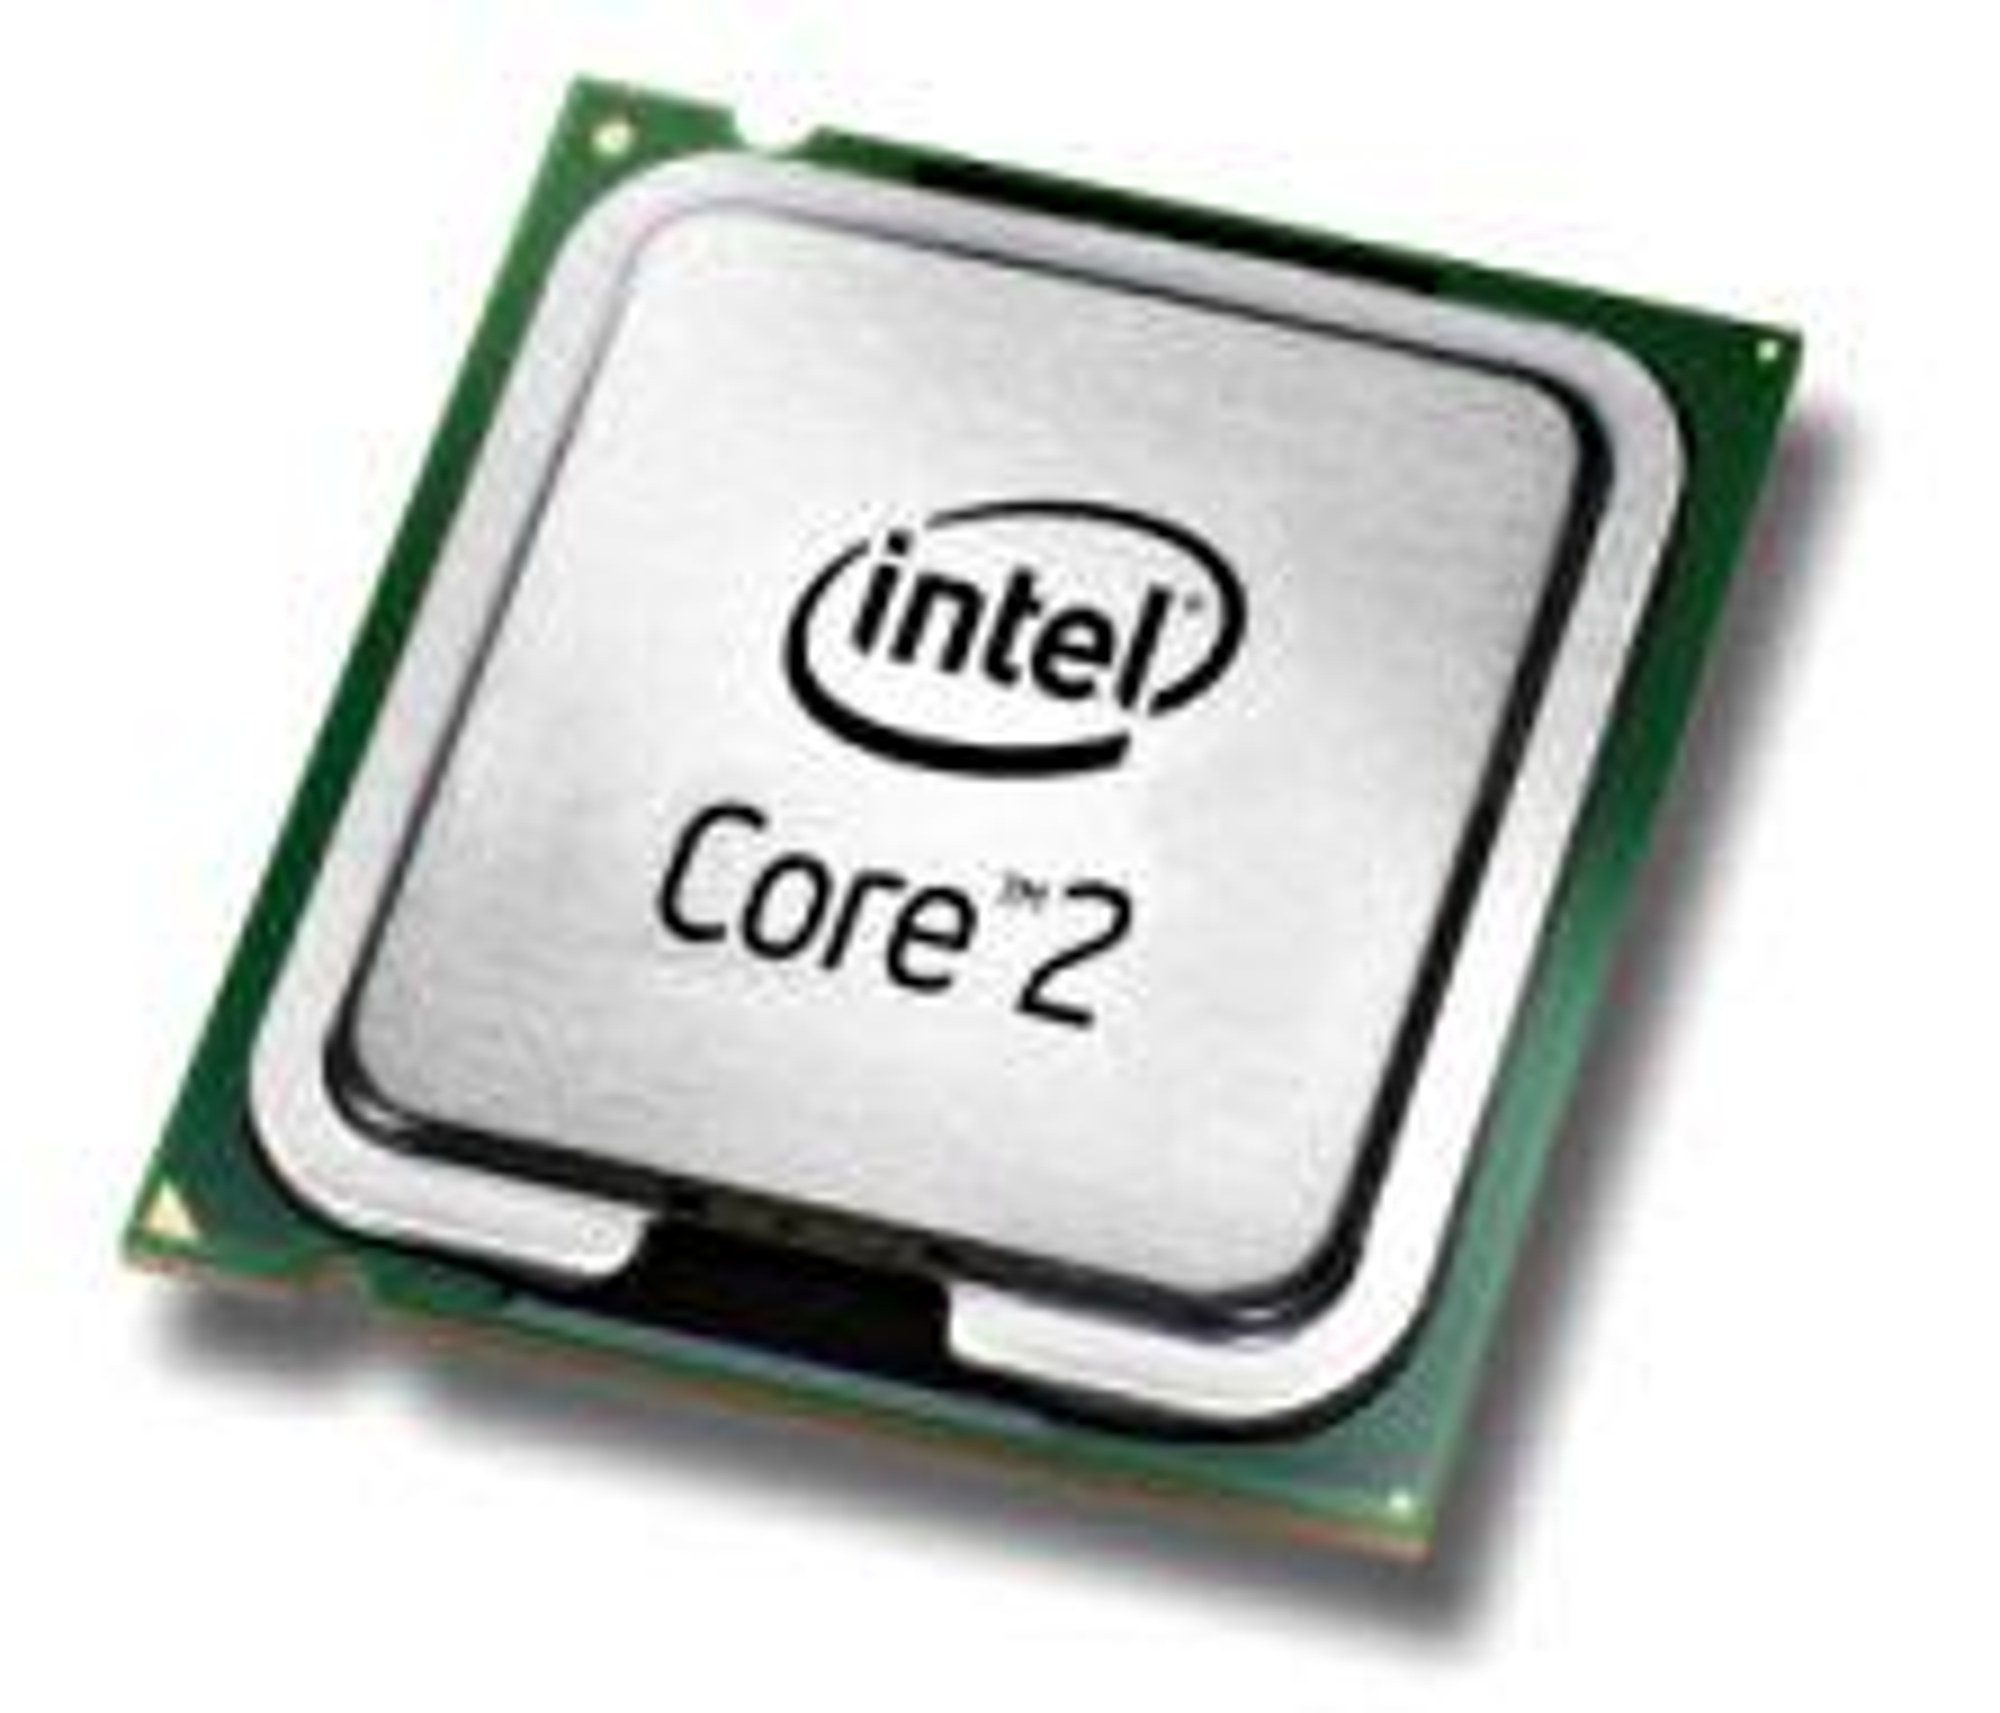 Intel Core 2: Bort med Duo og Quad